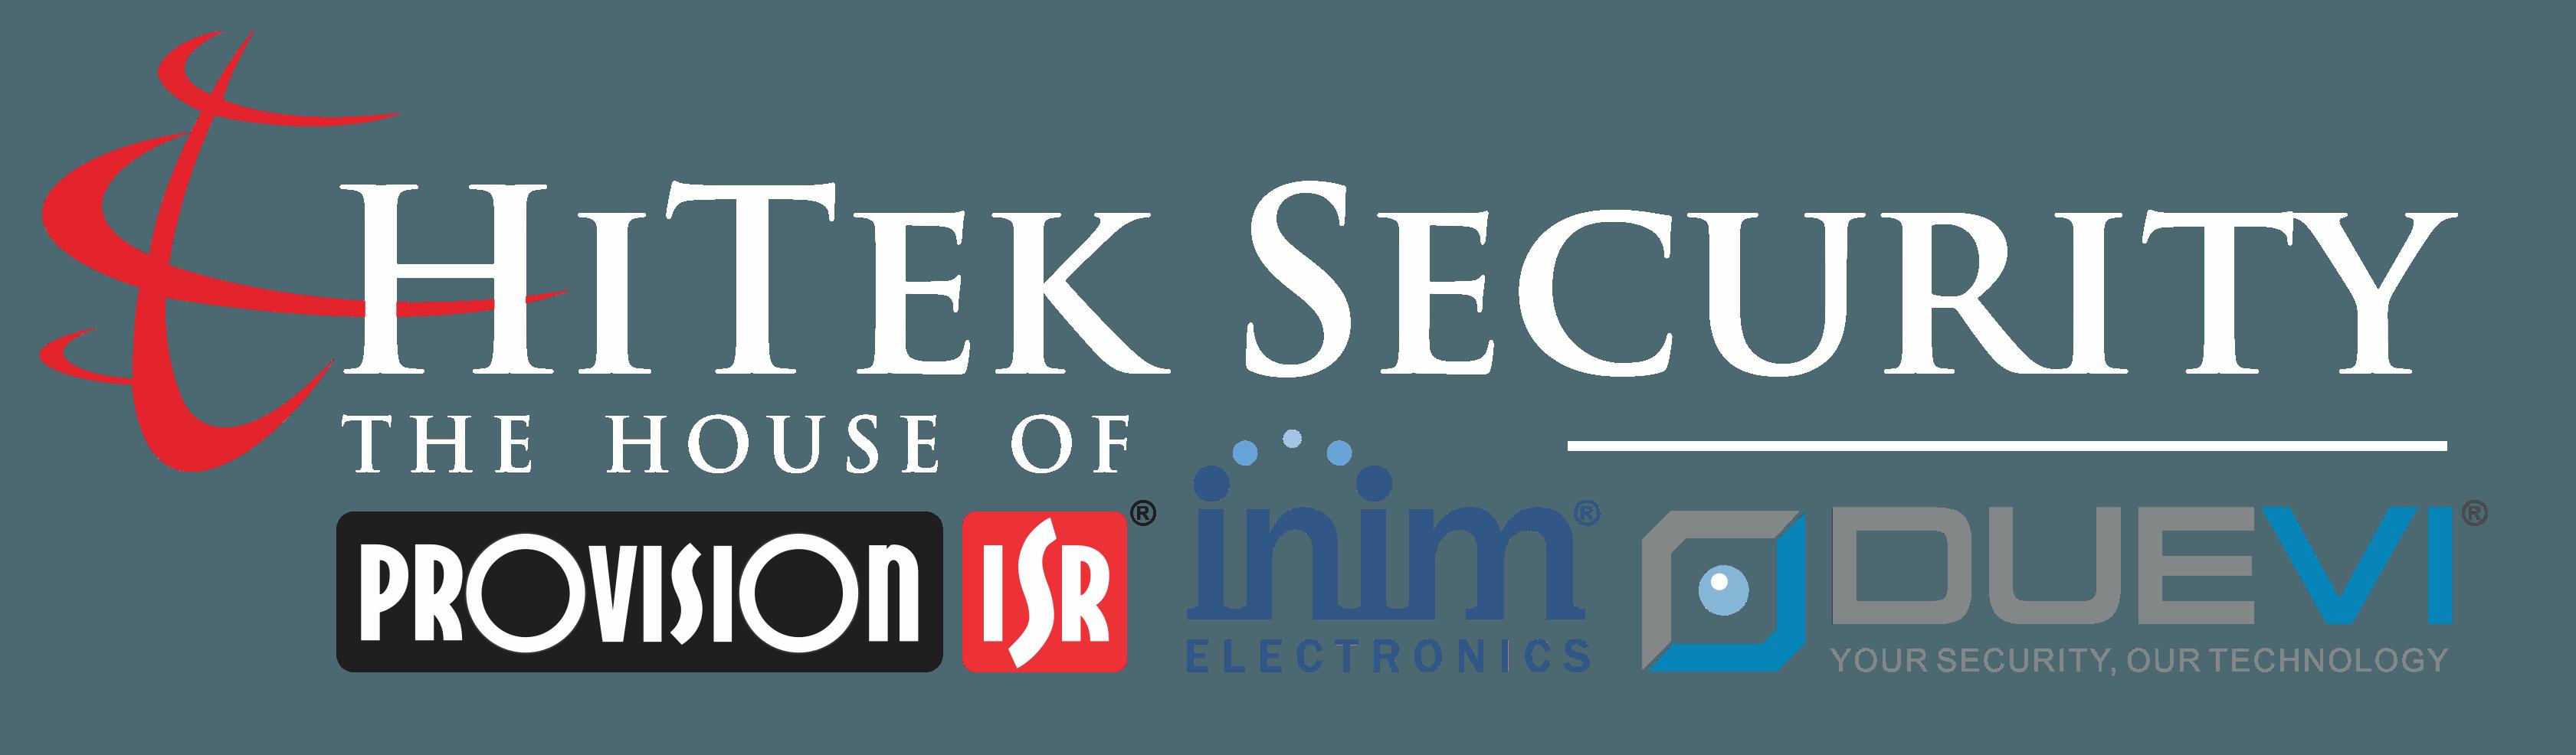 Hitek Security